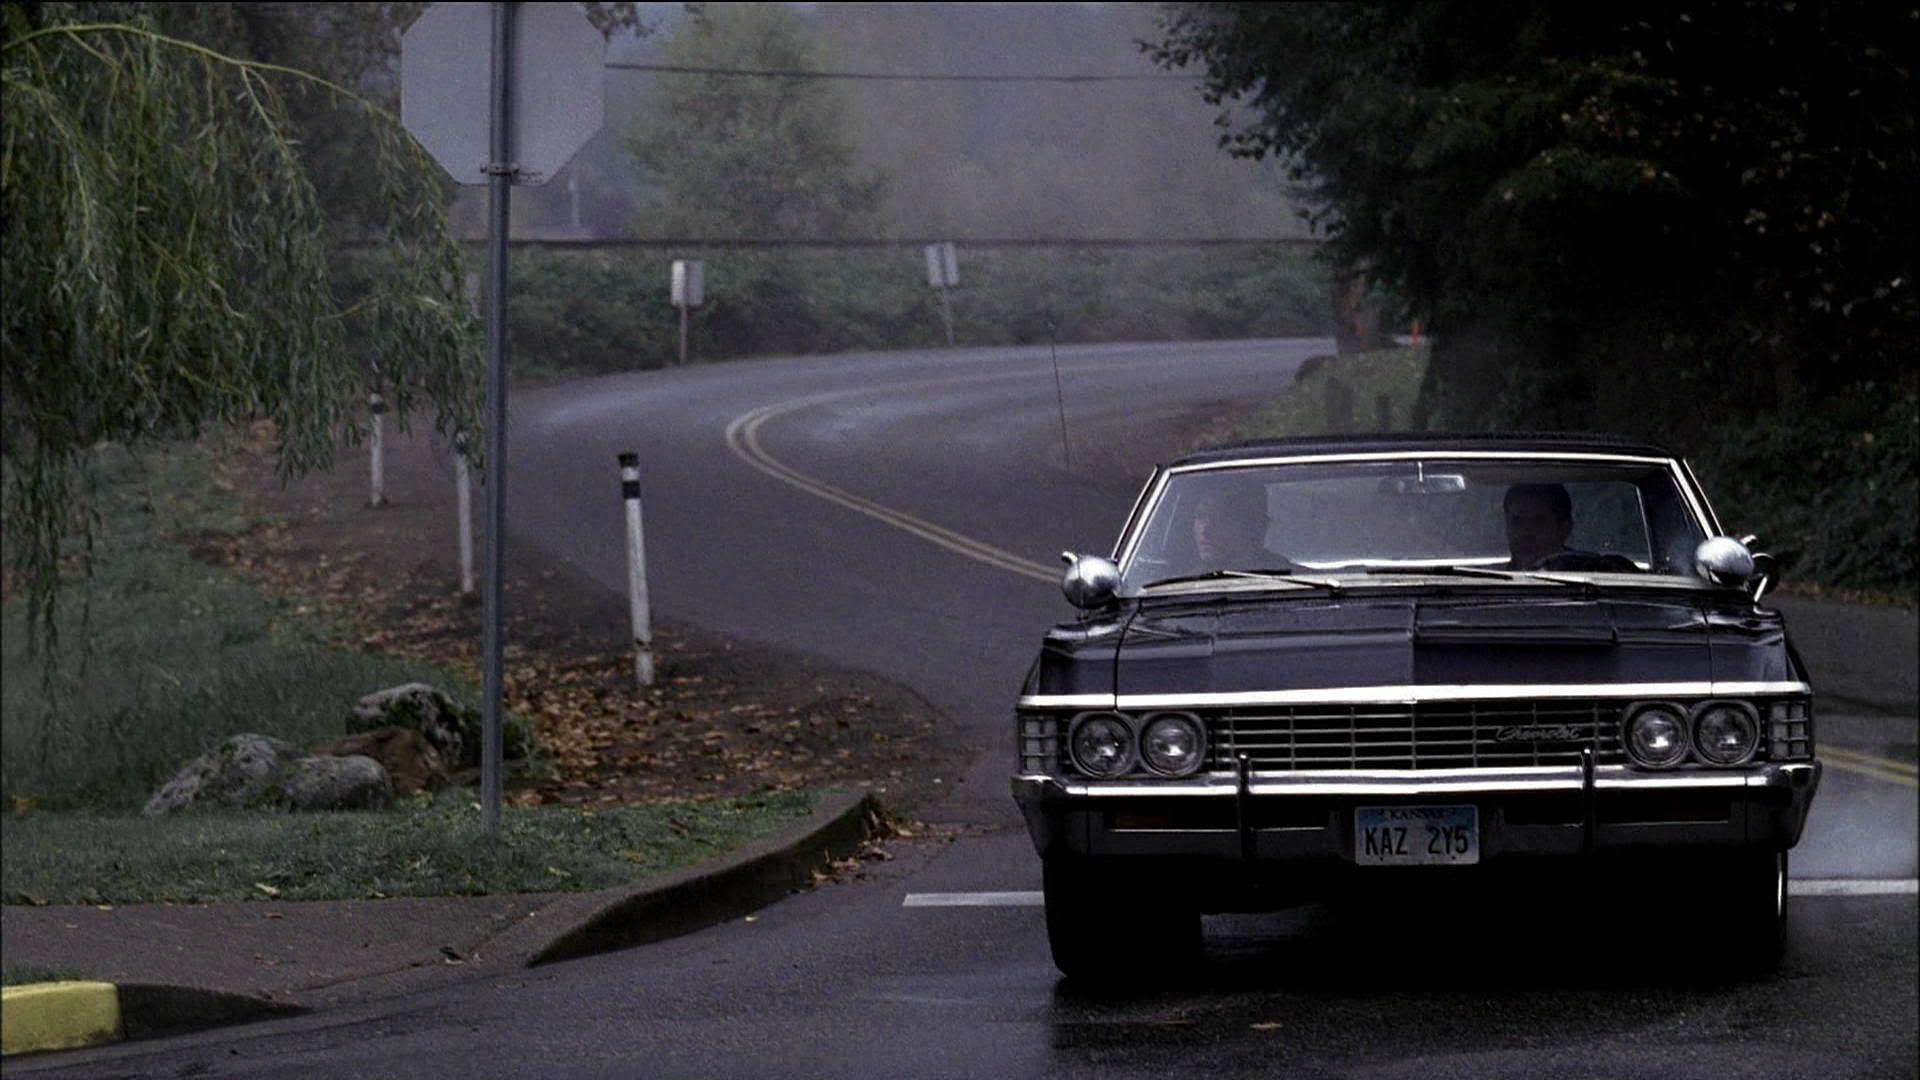 Pin By L I M M Y On Supernatural Supernatural Wallpaper Supernatural Dean Winchester Impala